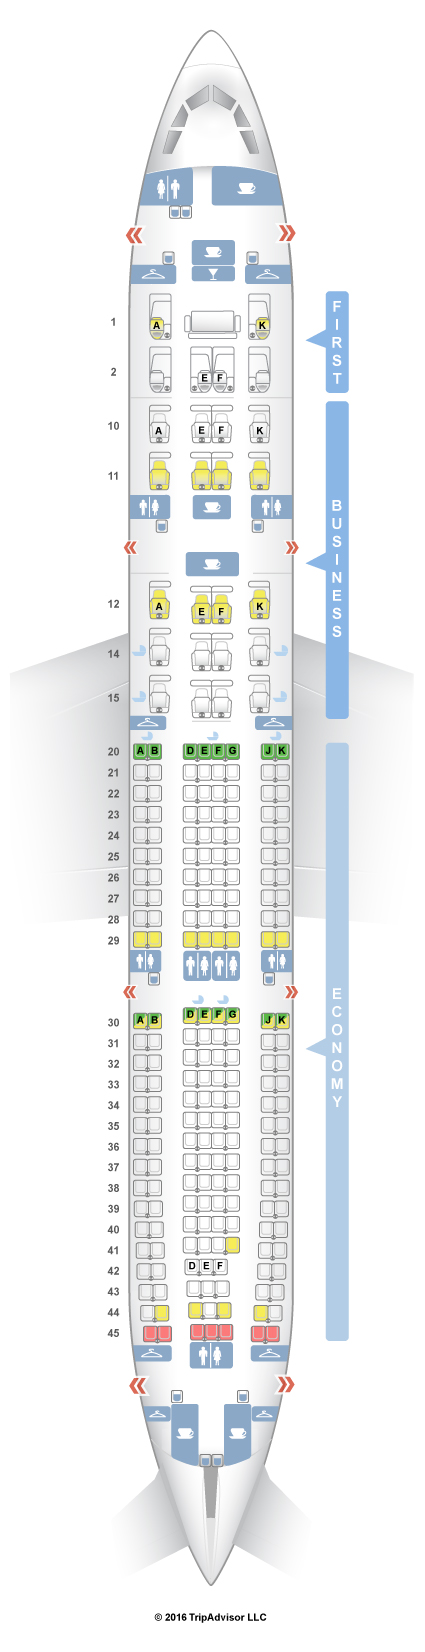 SeatGuru Seat Map Oman Air - SeatGuru